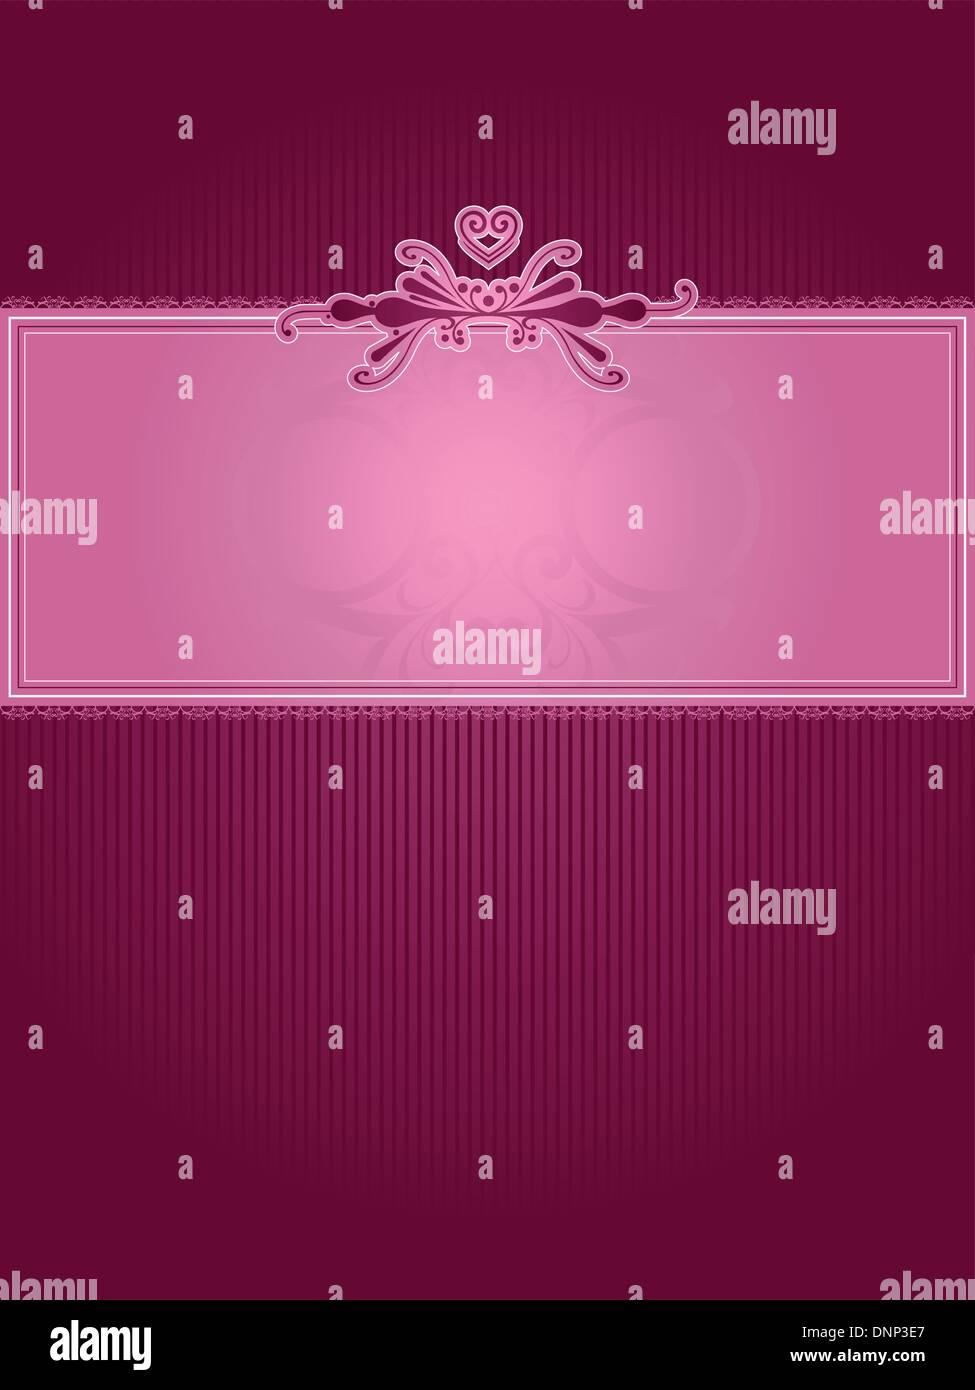 Antecedentes San Valentín decorativas Imagen De Stock